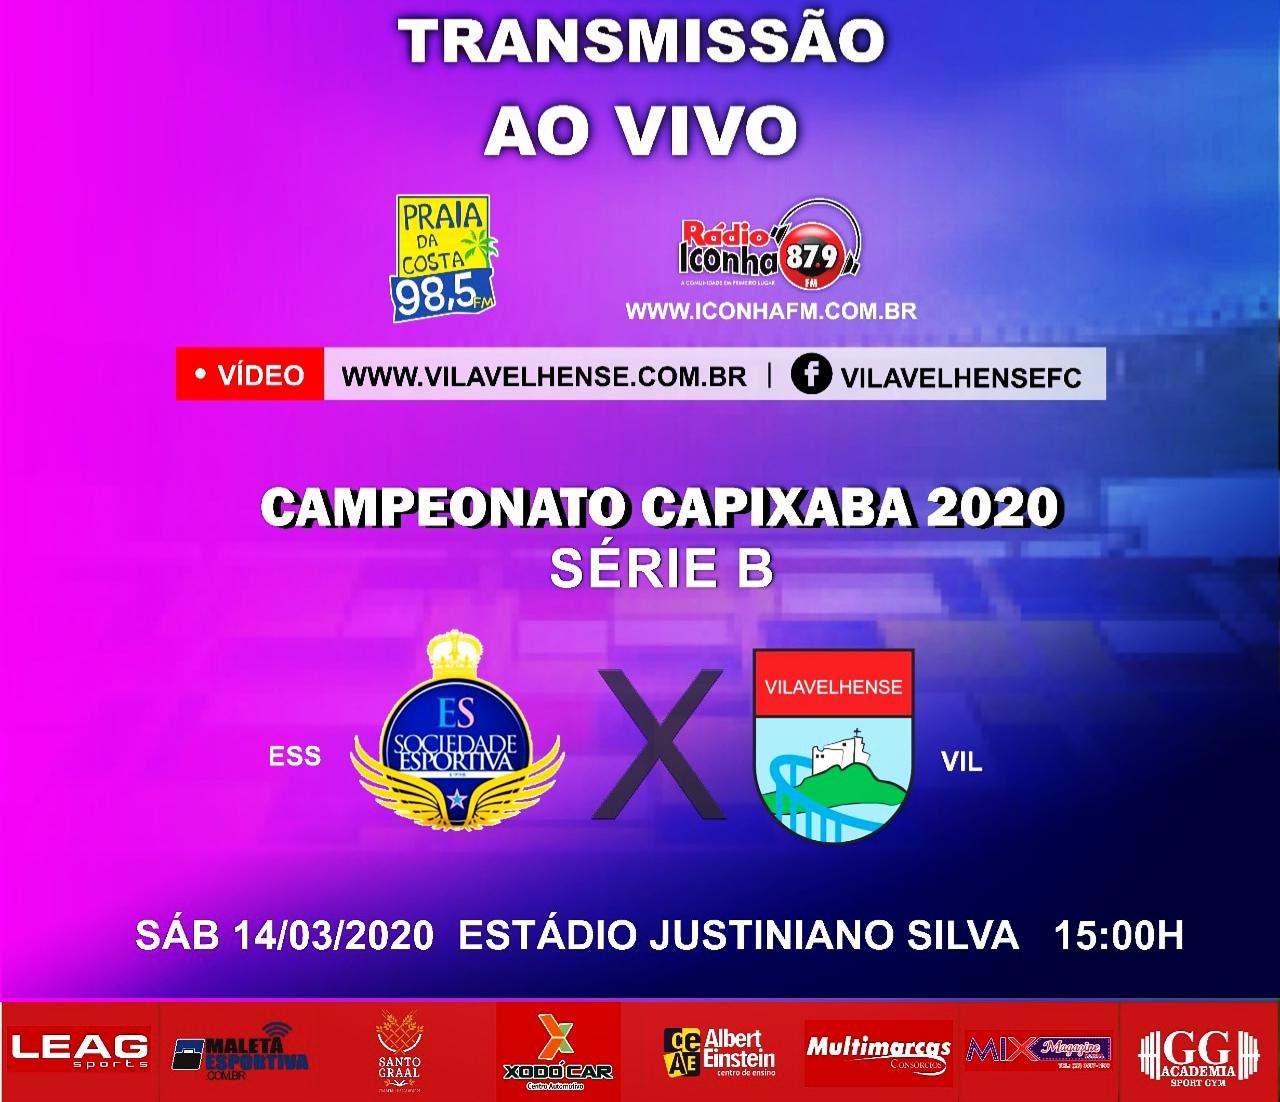 campeonato capixaba seri B 2020 - ao vivo na rádio iconha fm